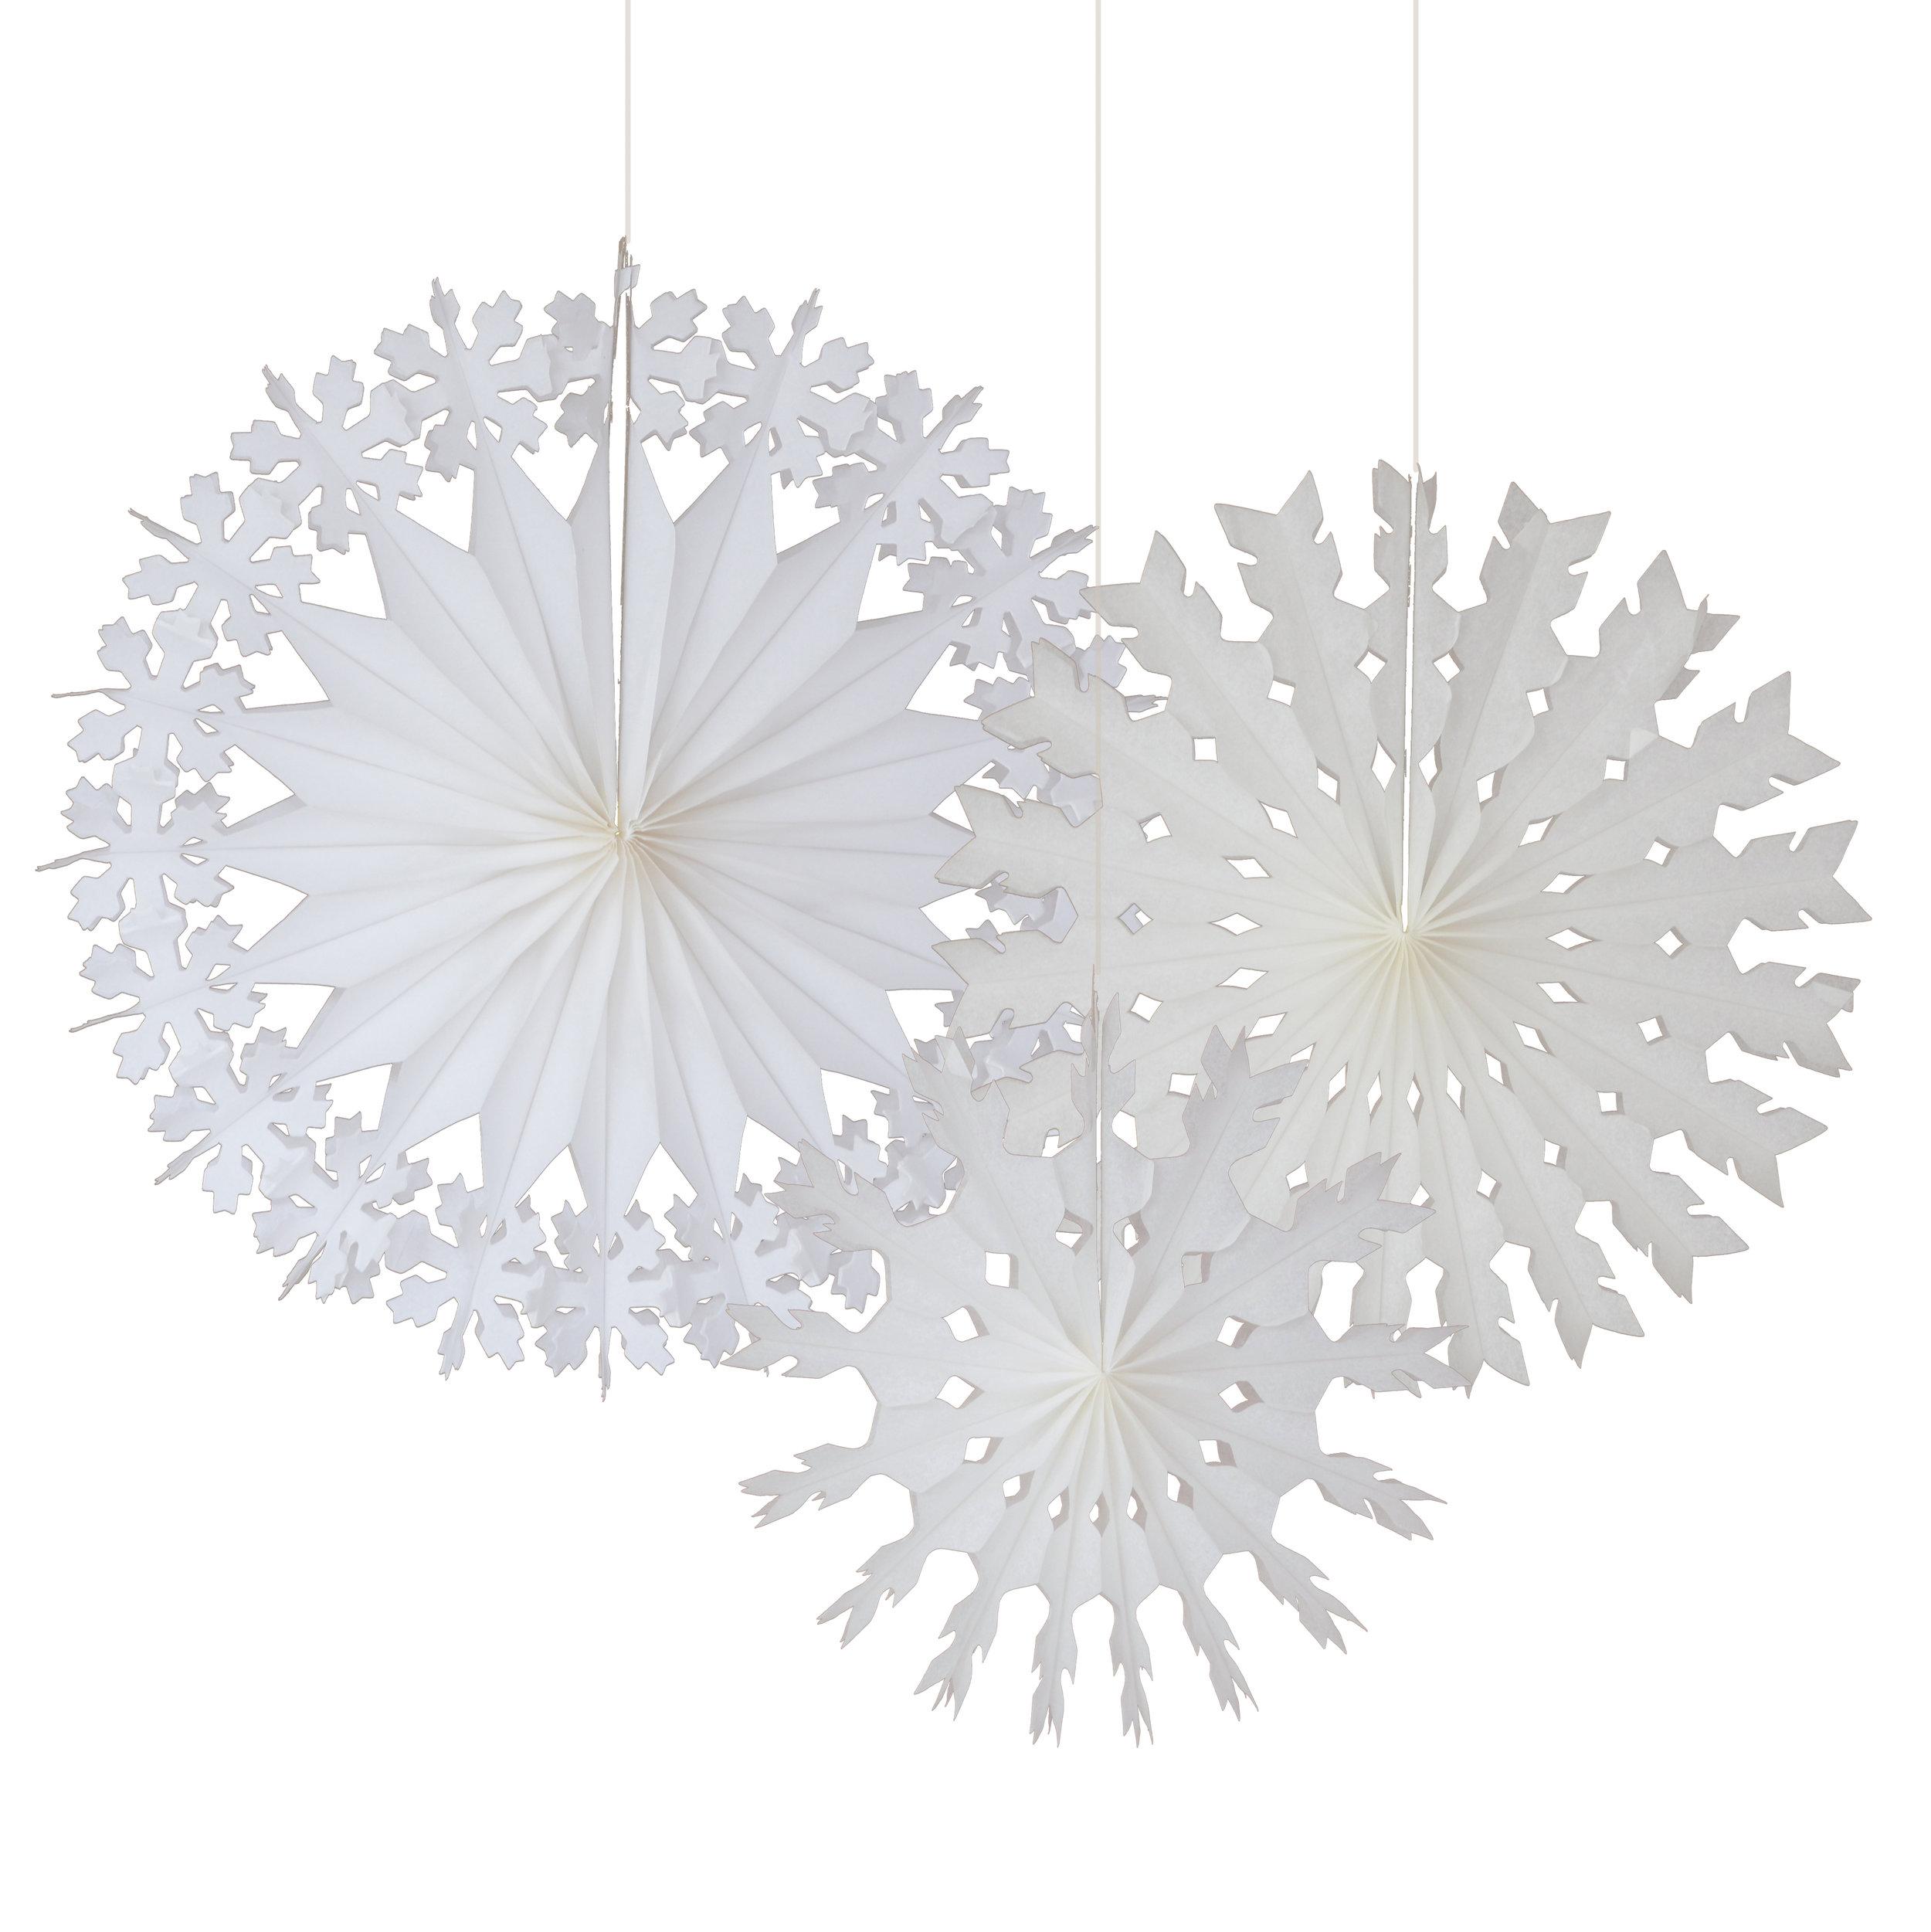 Engel 3 large snowflake decorations